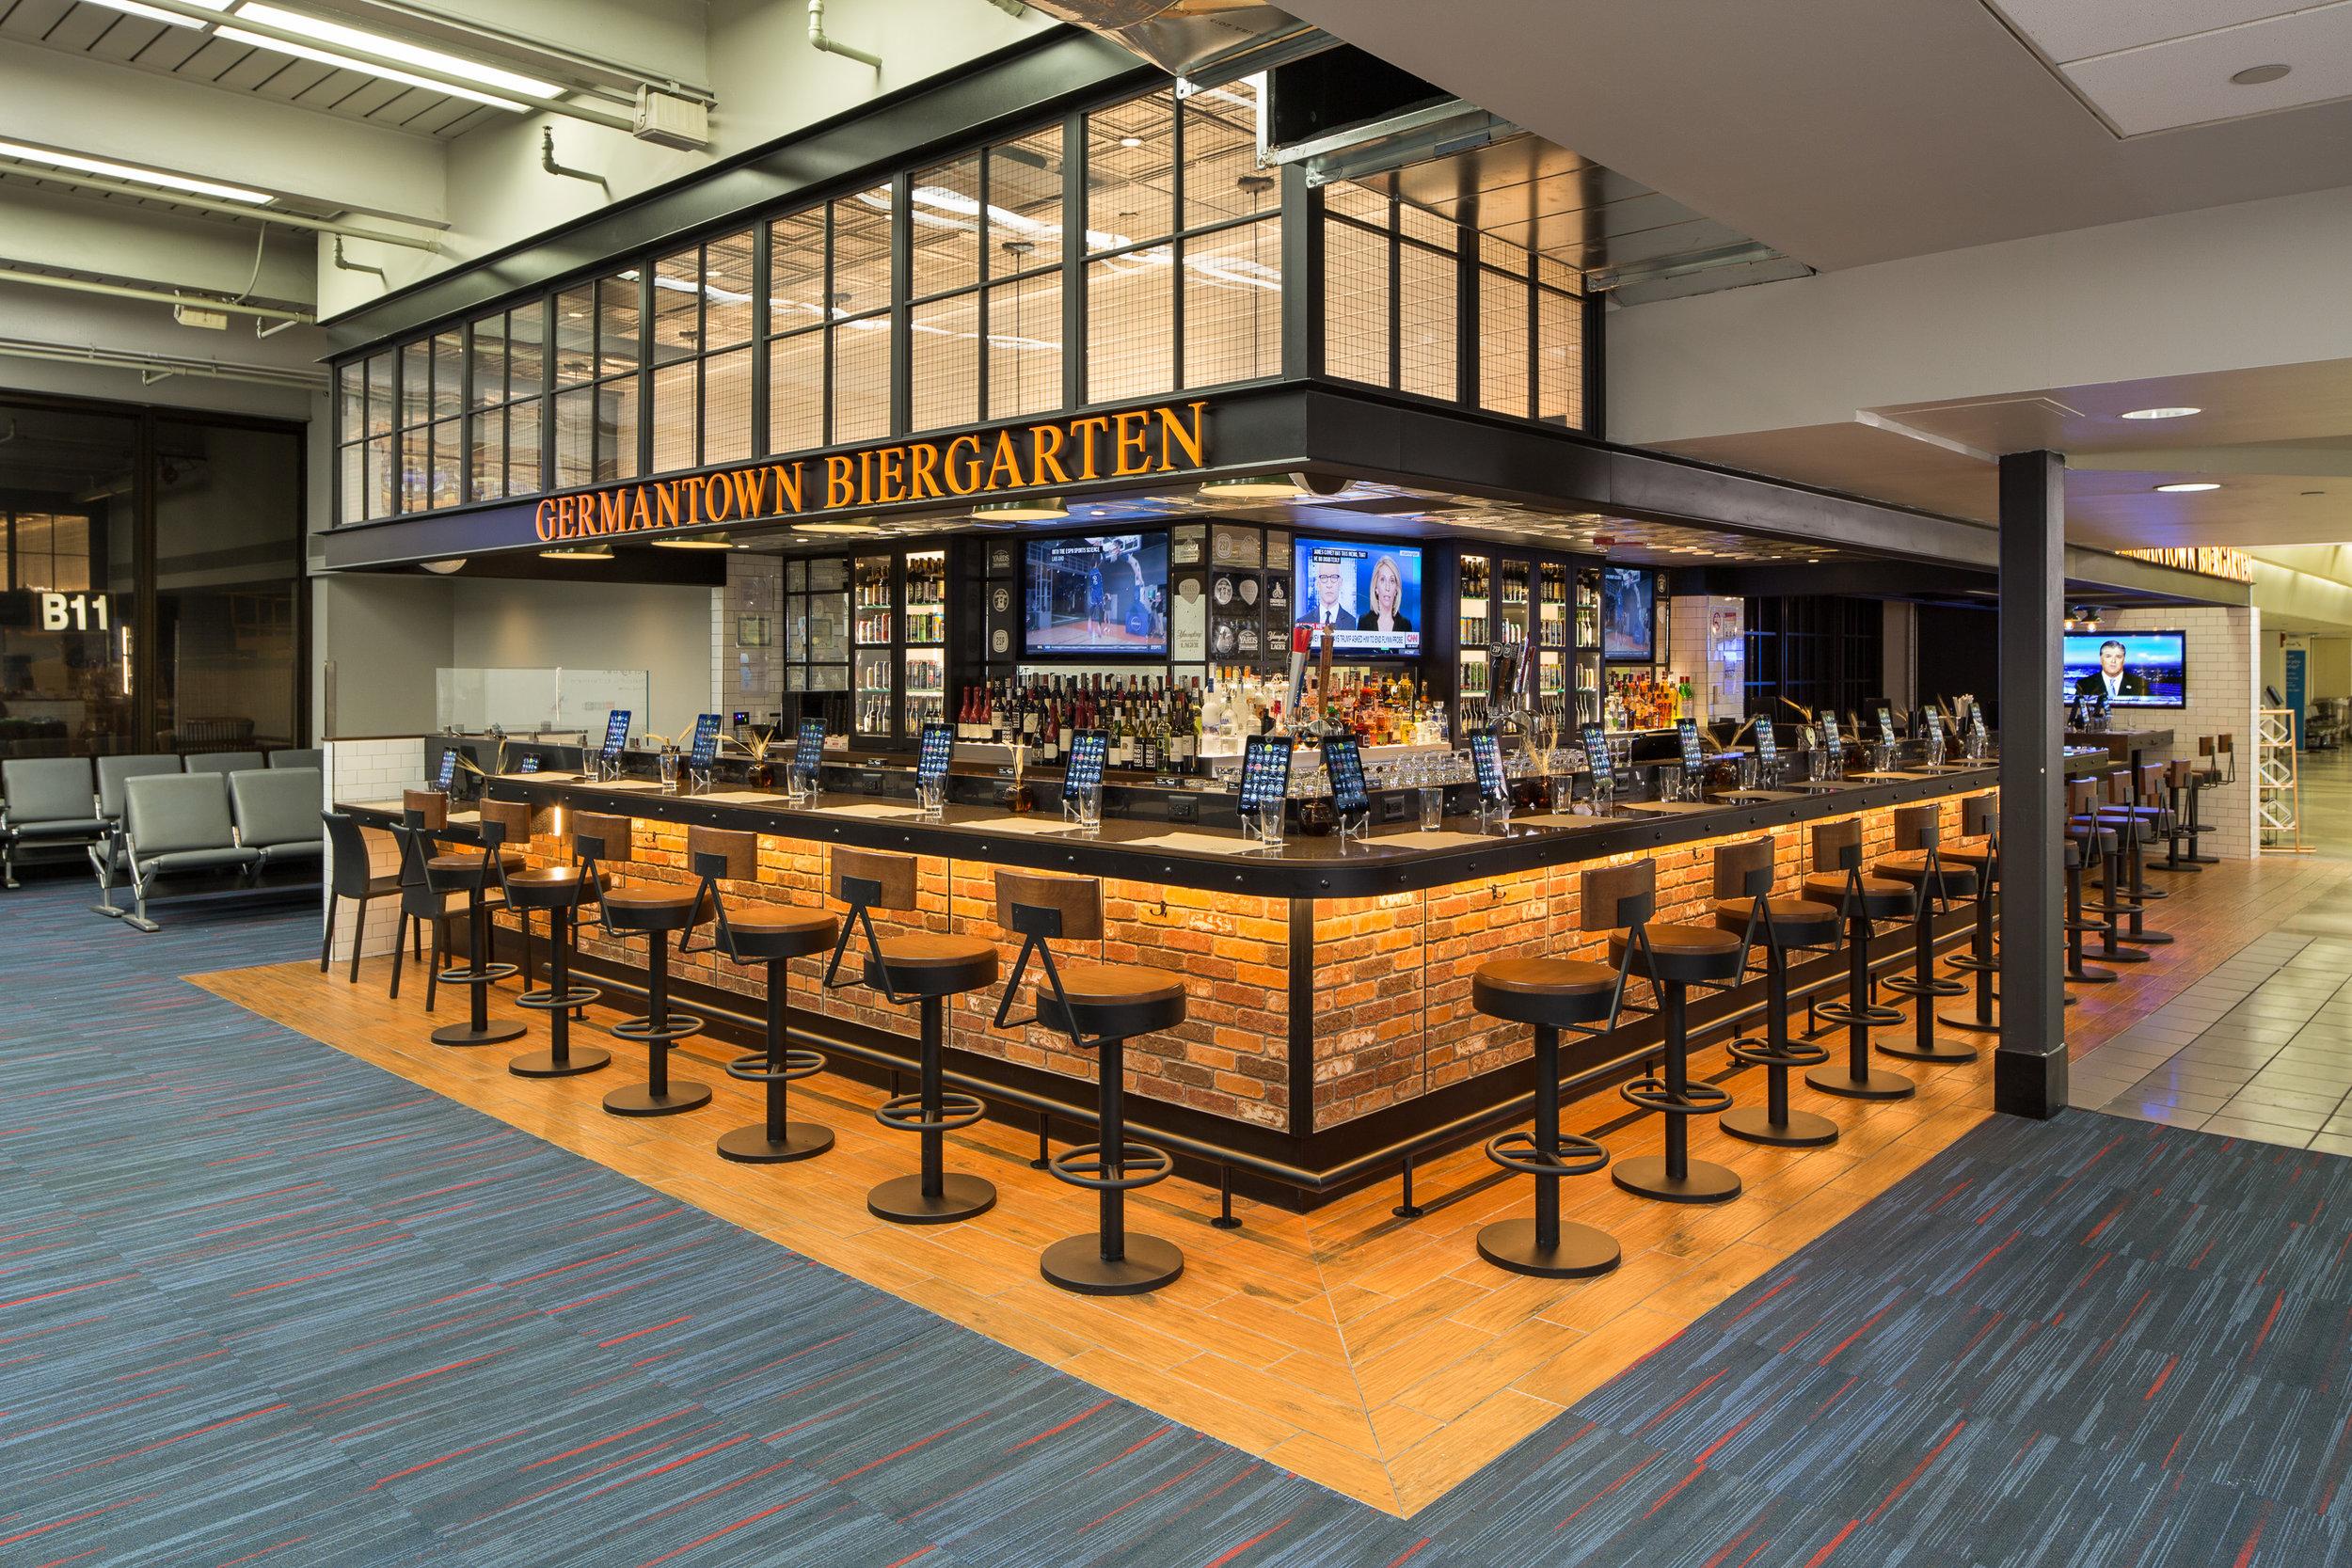 Germantown Biergarten, Terminal B, Philadelphia Airport